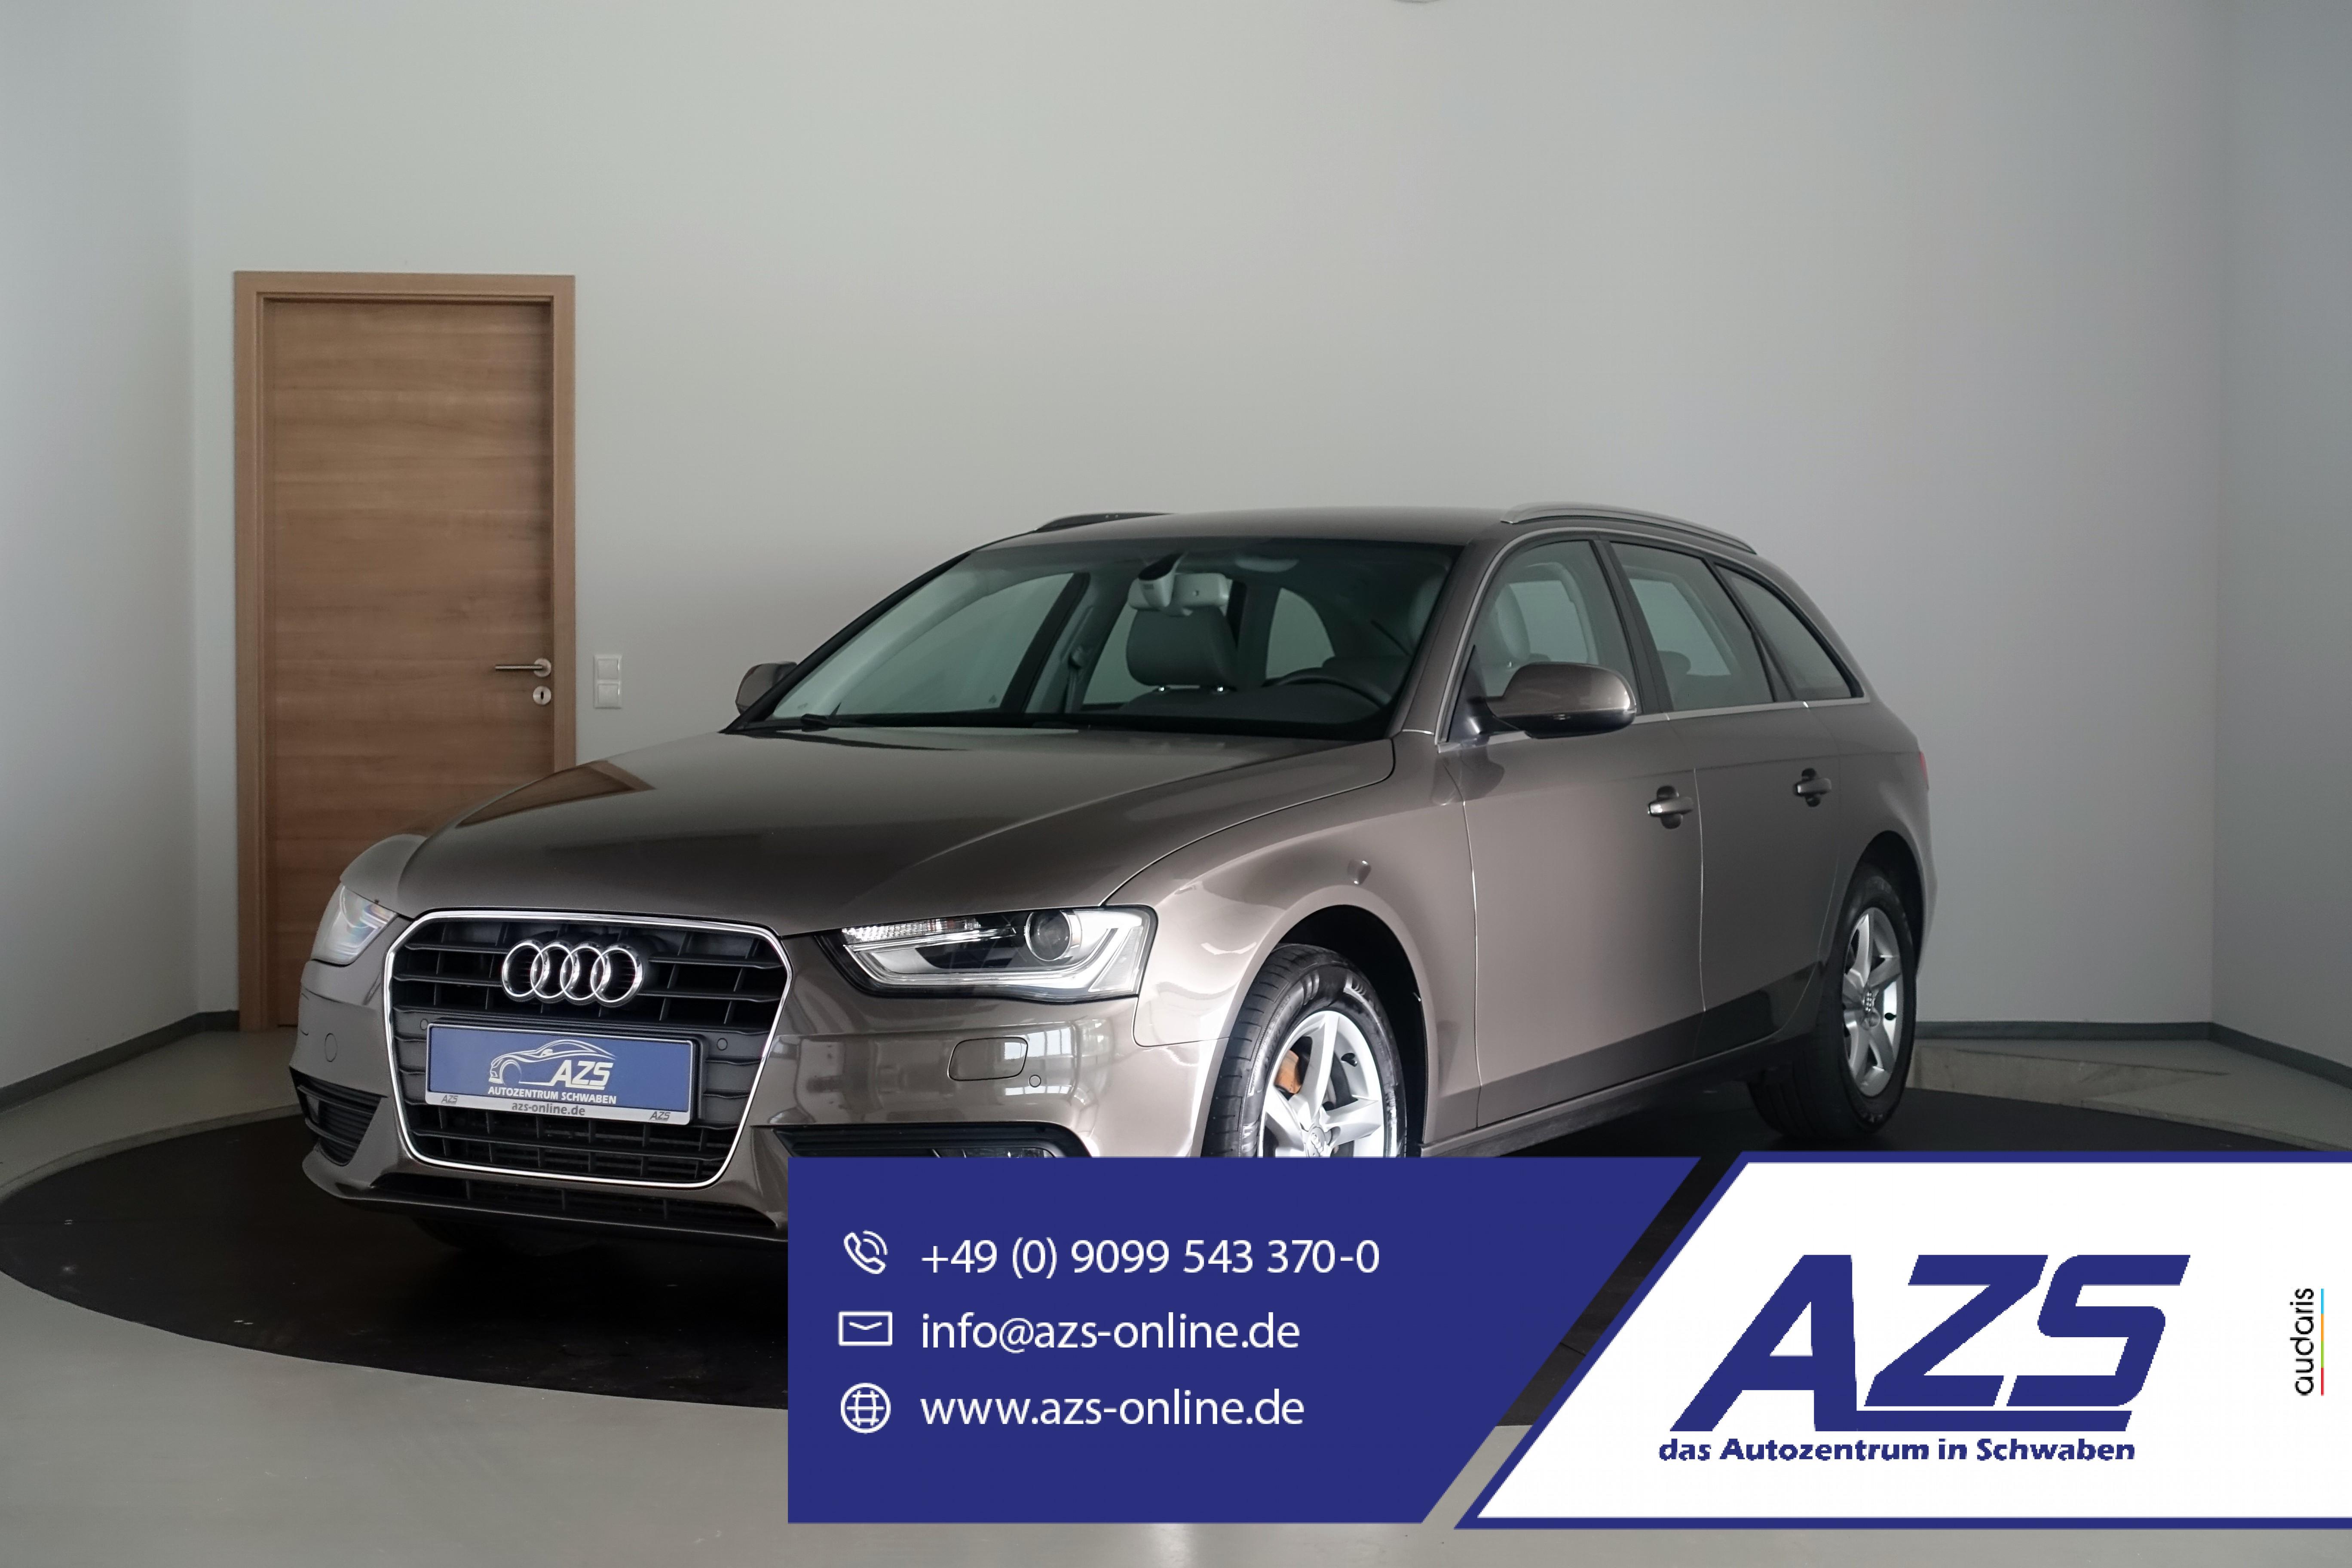 Audi A4 2.0 TDI Avant Ambiente | Navi | Bi-Xenon |, Jahr 2015, Diesel